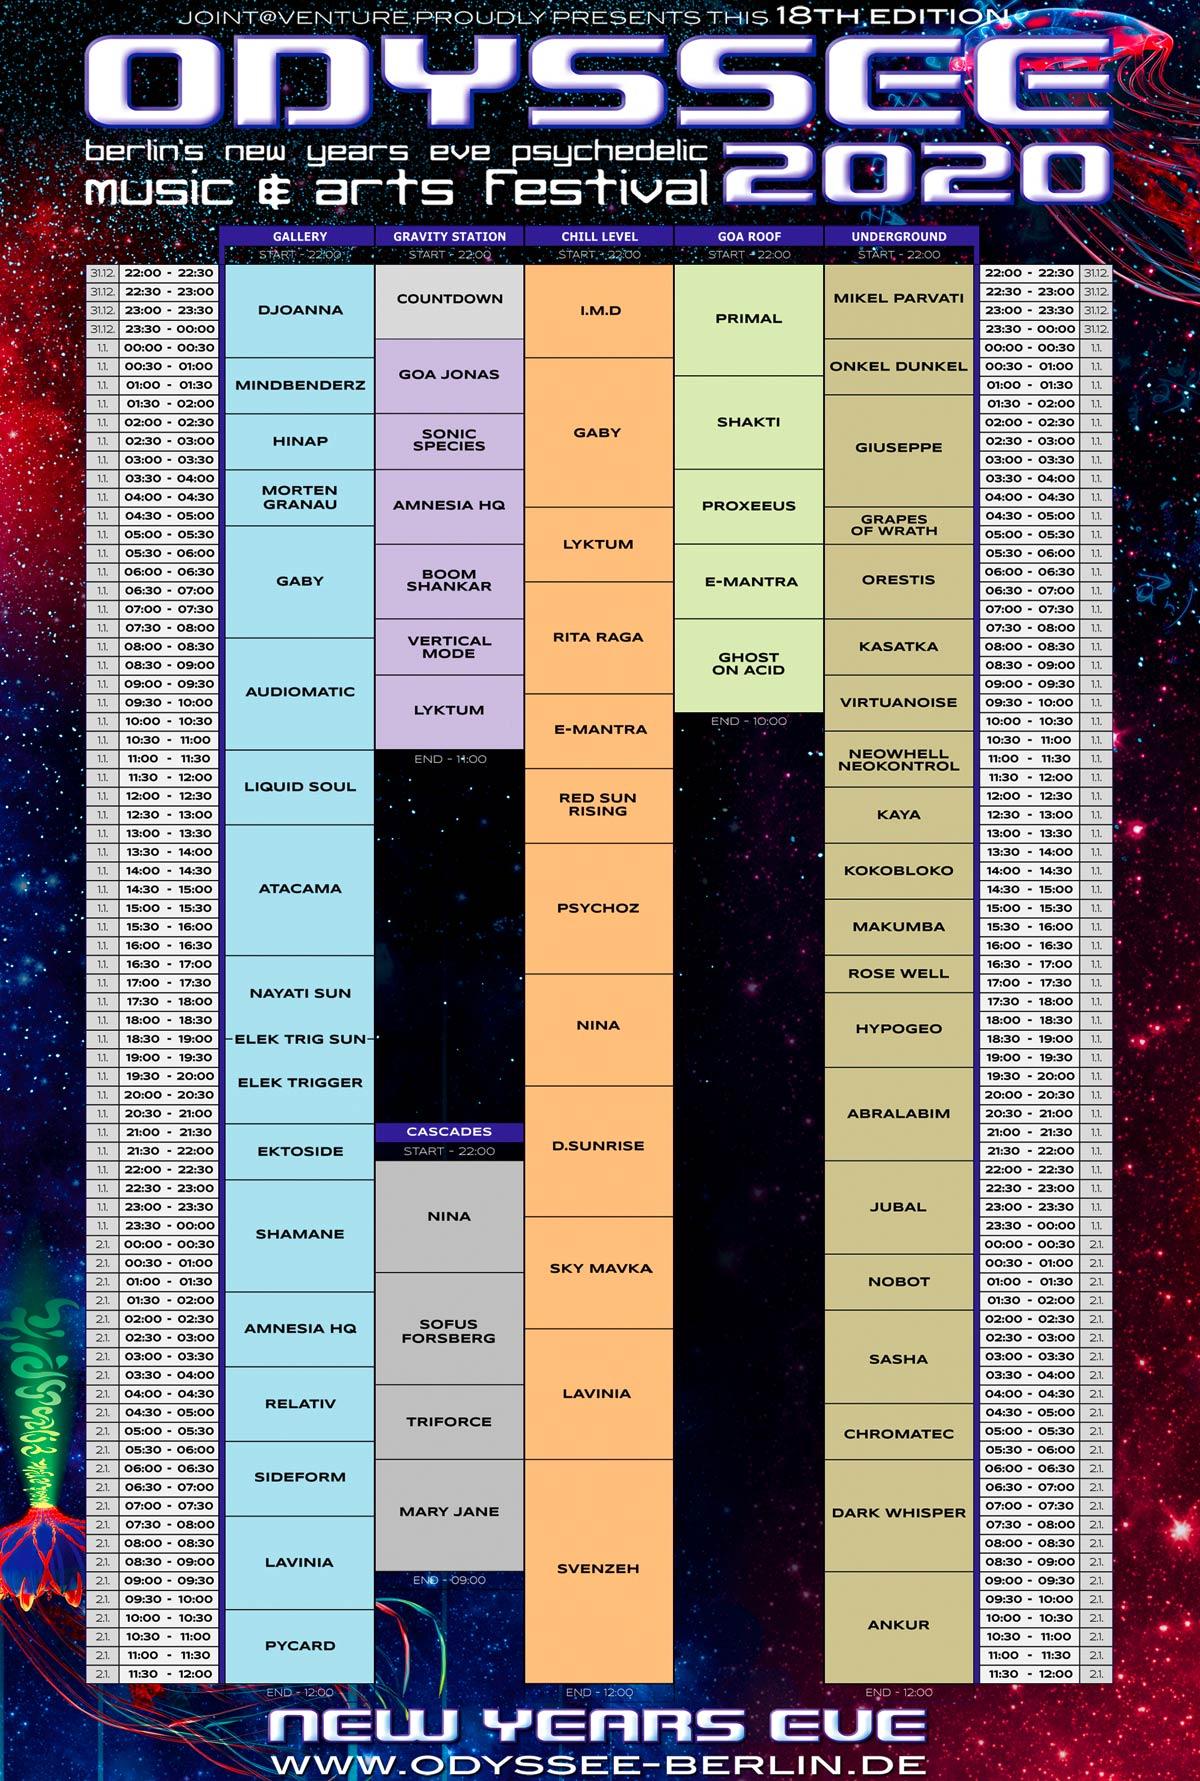 Odyssee 2020 Timetable